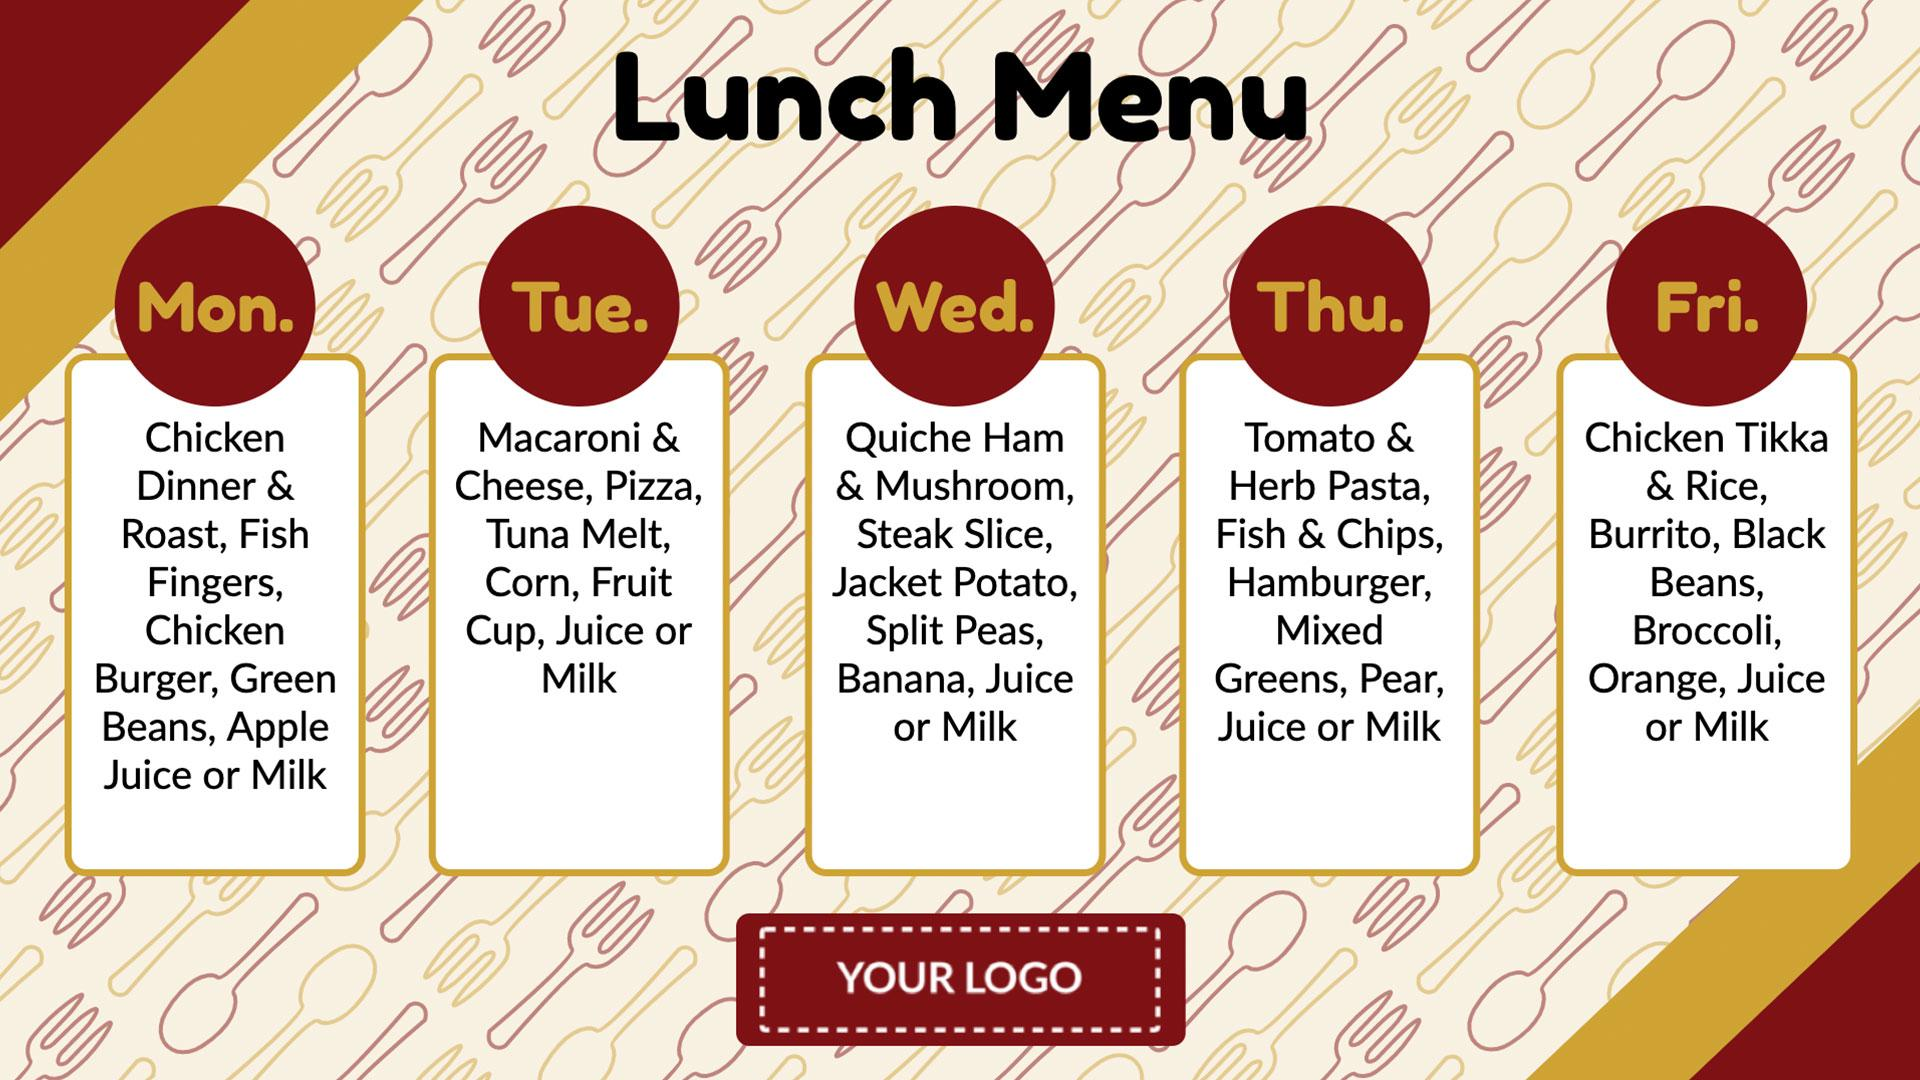 Weekly Lunch Menu Digital Signage Template